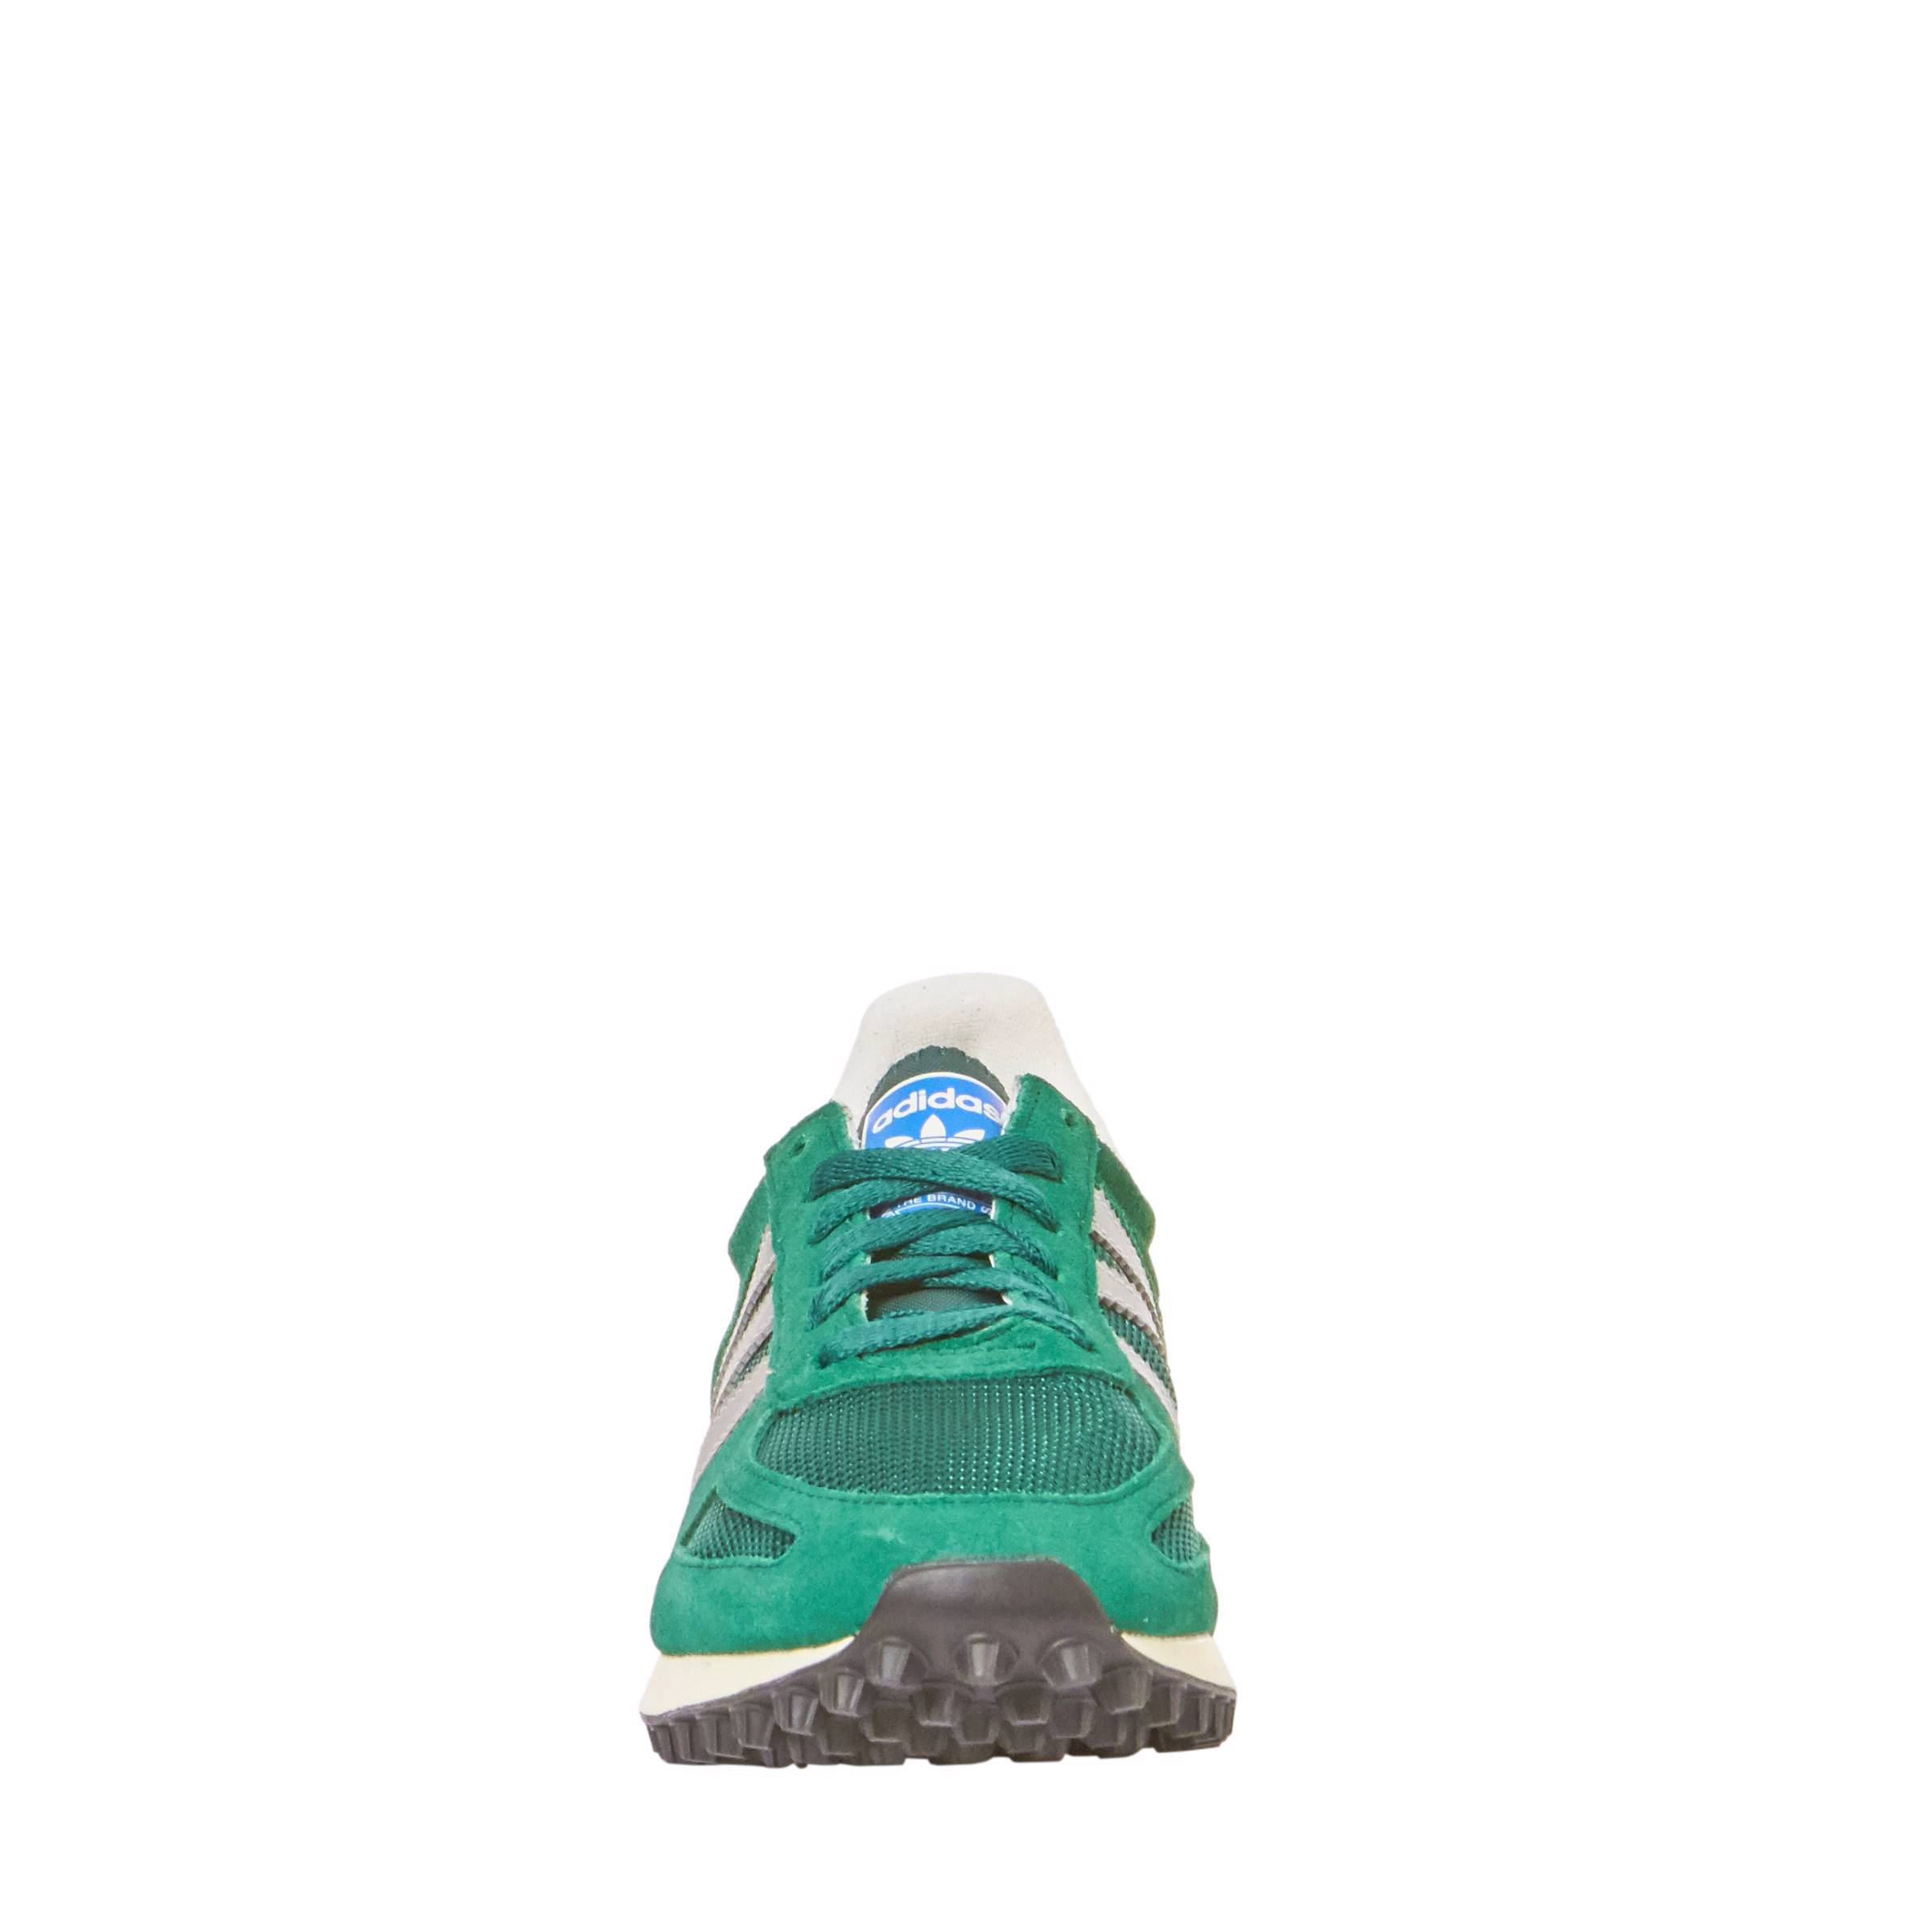 adidas originals adidas Originals LA Trainer OG sneakers